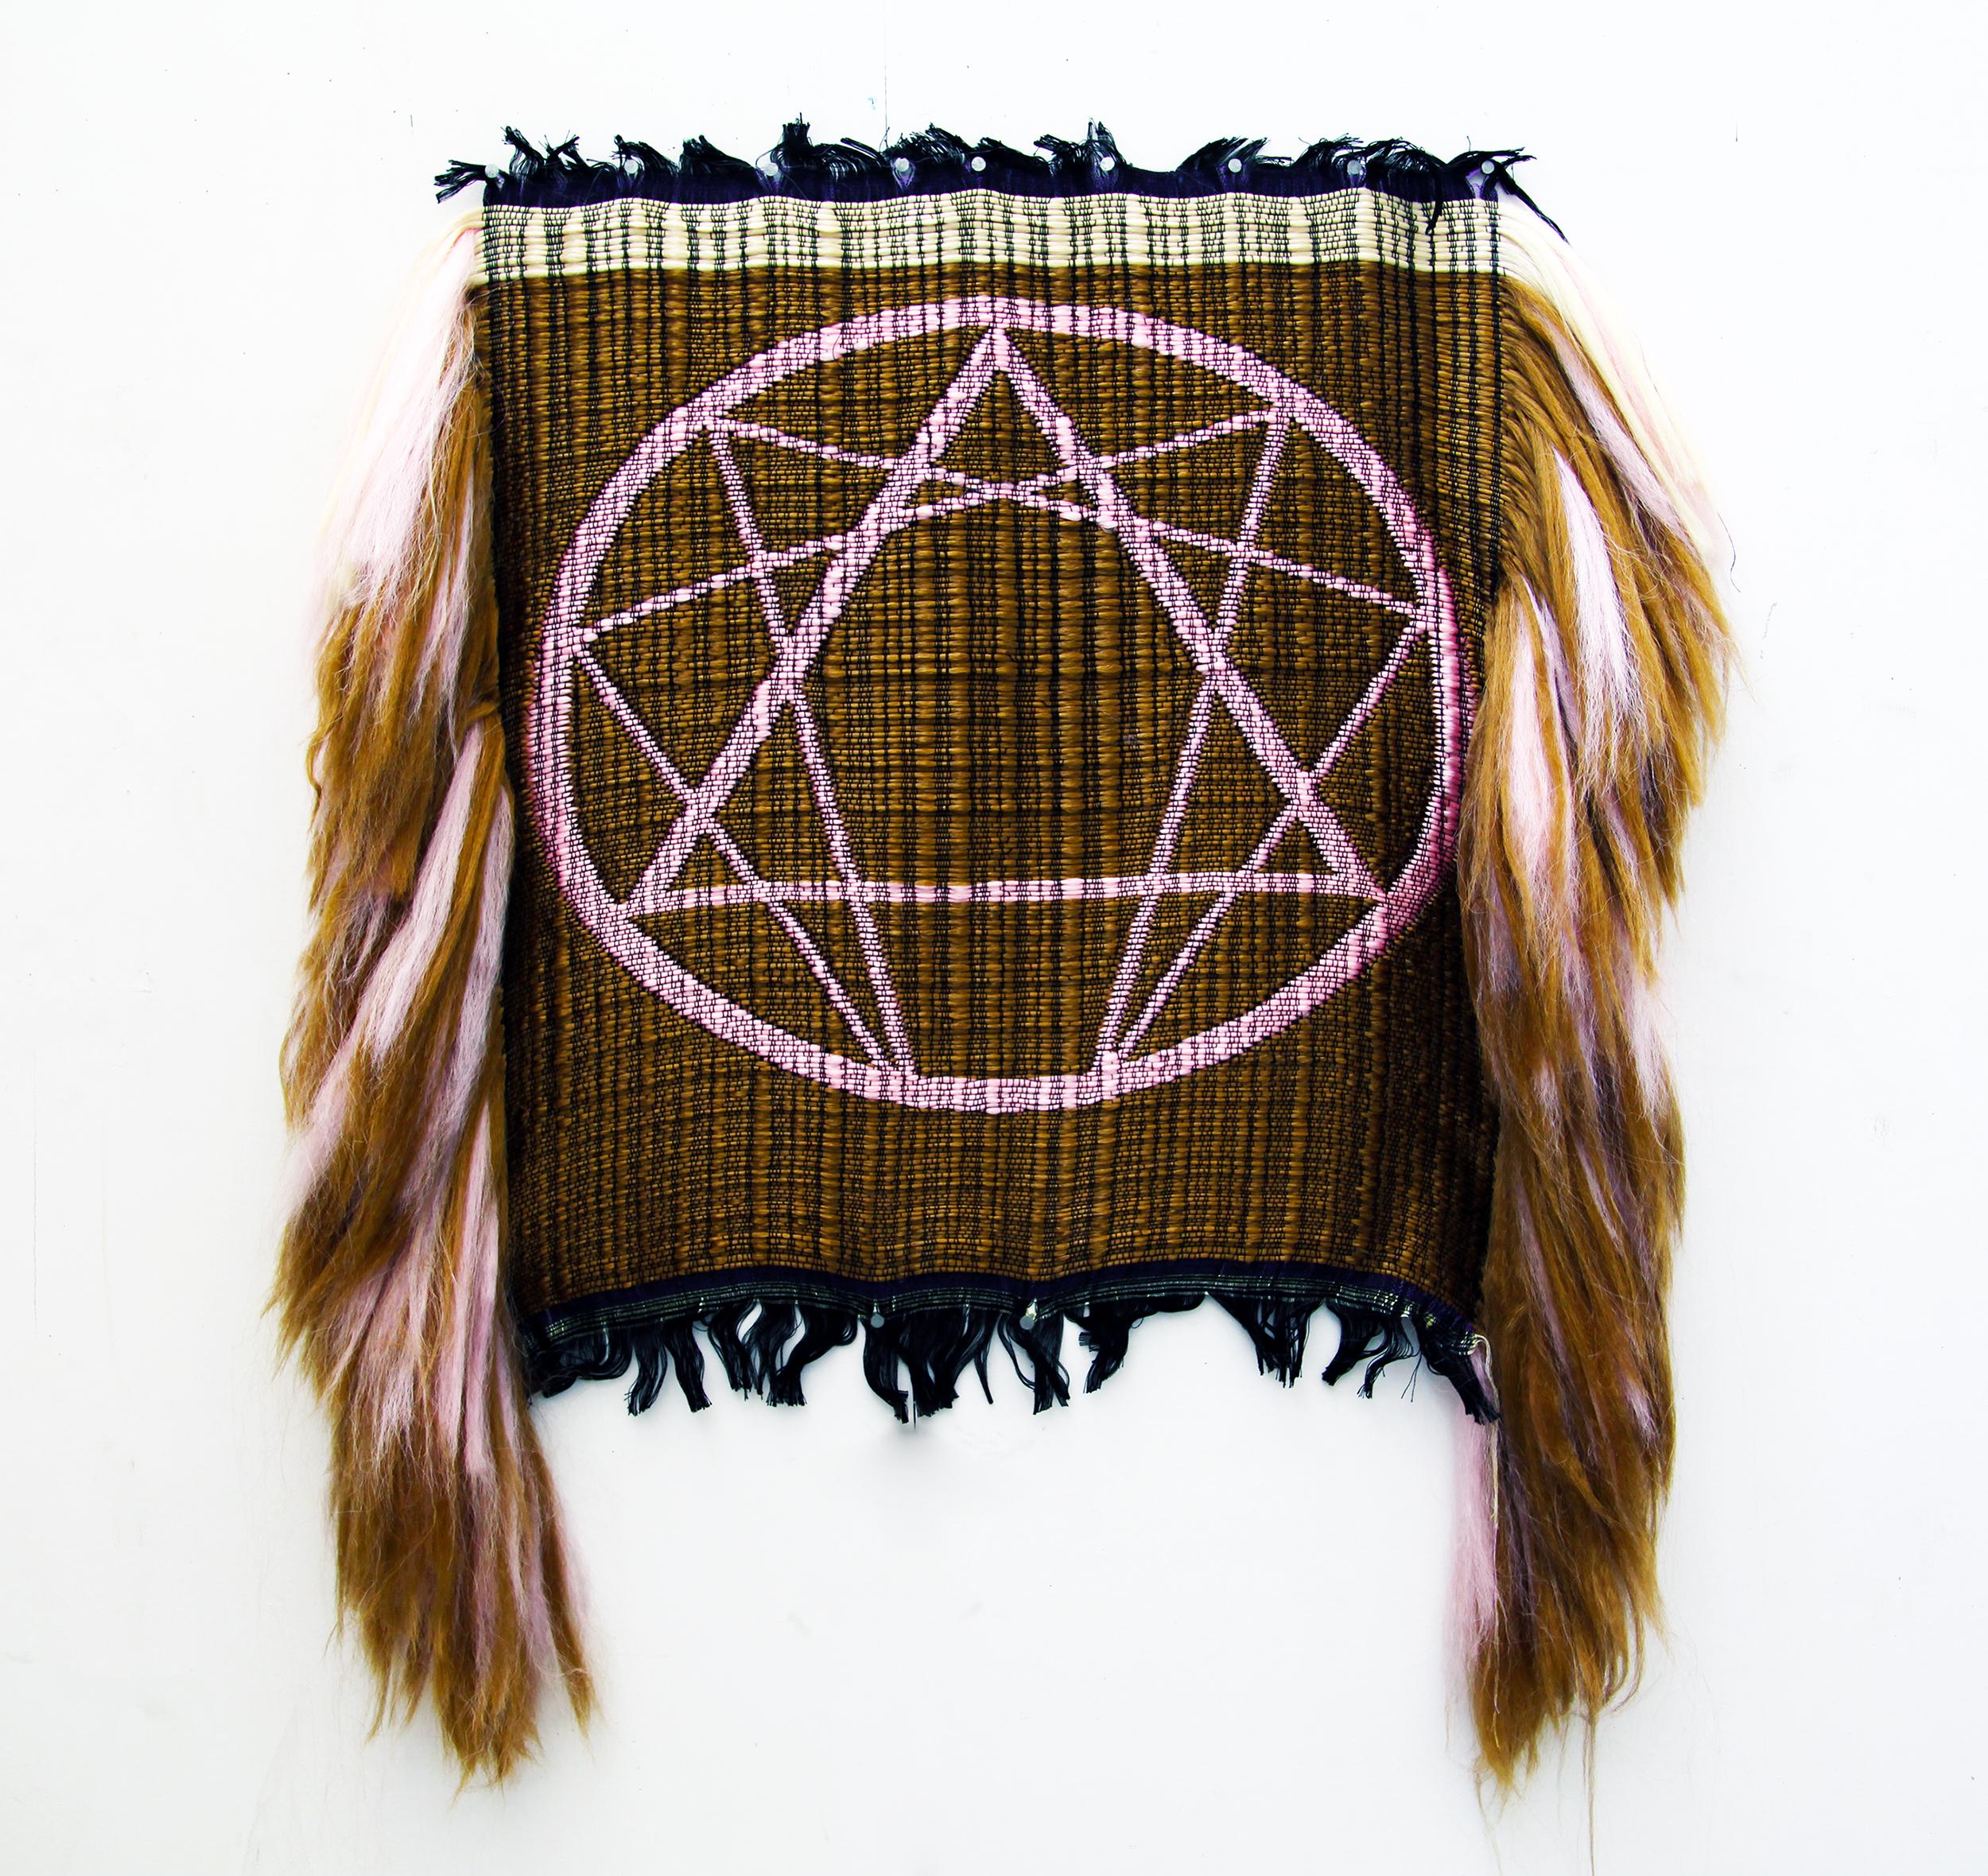 """Weave (for spell)"". Amaryllis DeJesus Moleski"